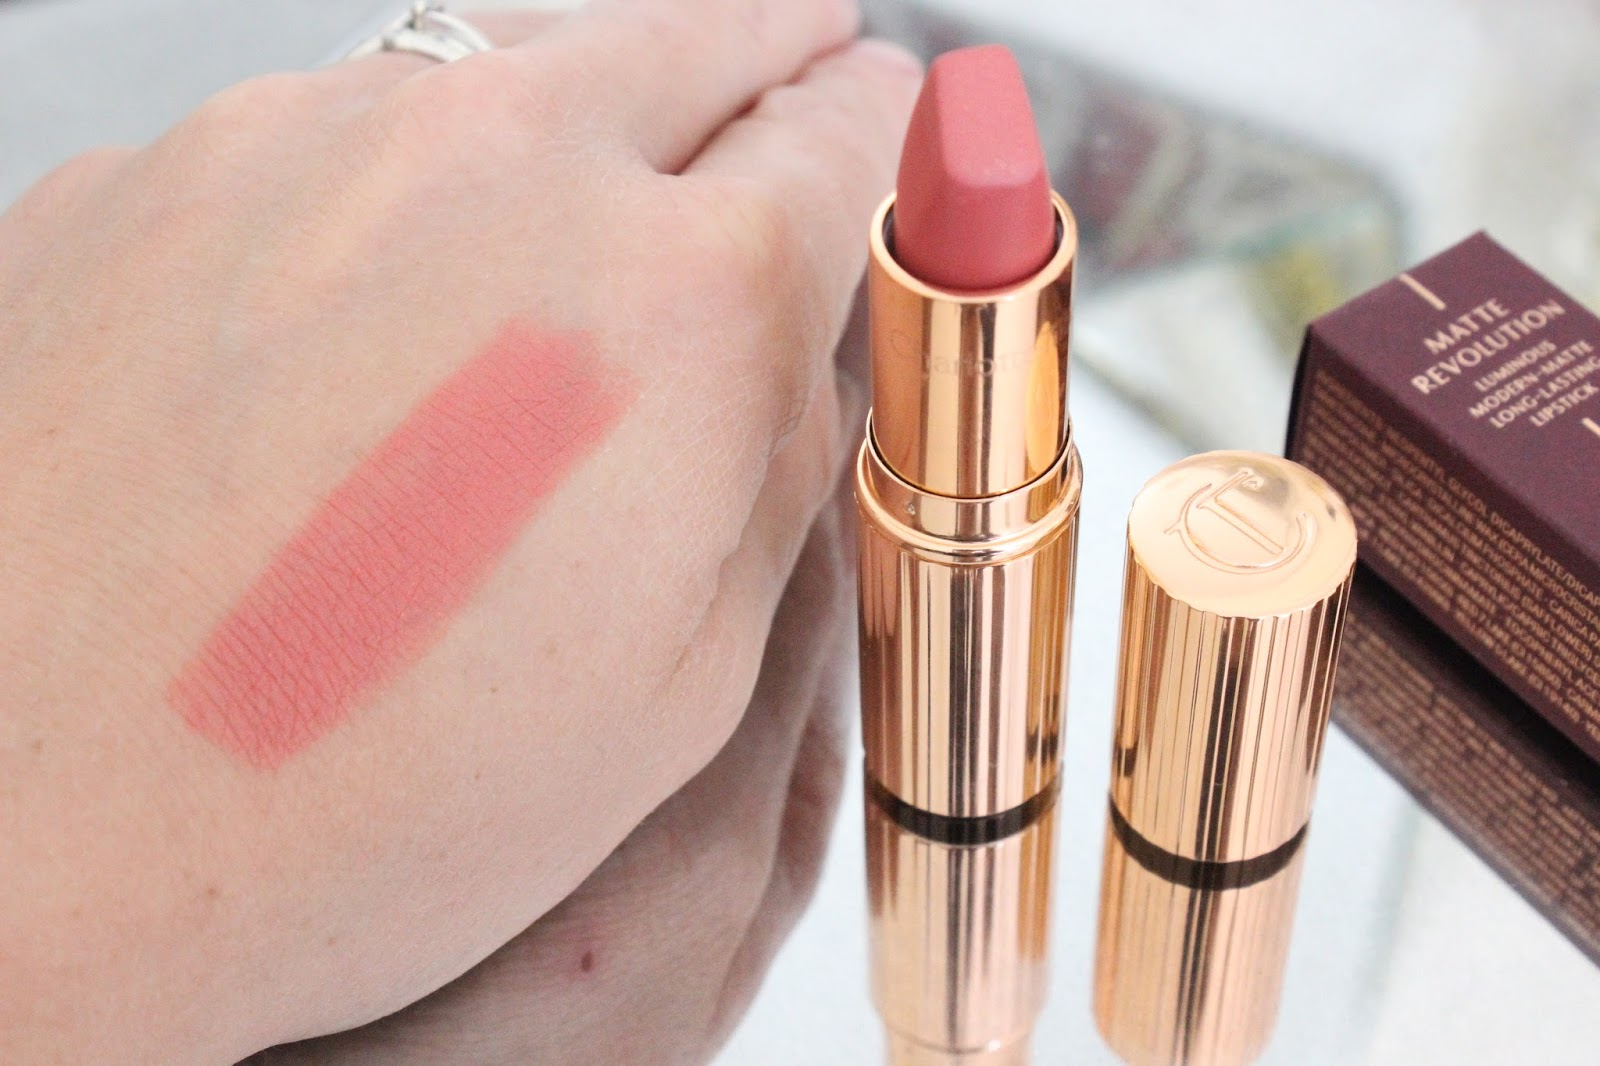 Charlotte Tilbury Matte Revolution Lipstick | Sexy Sienna